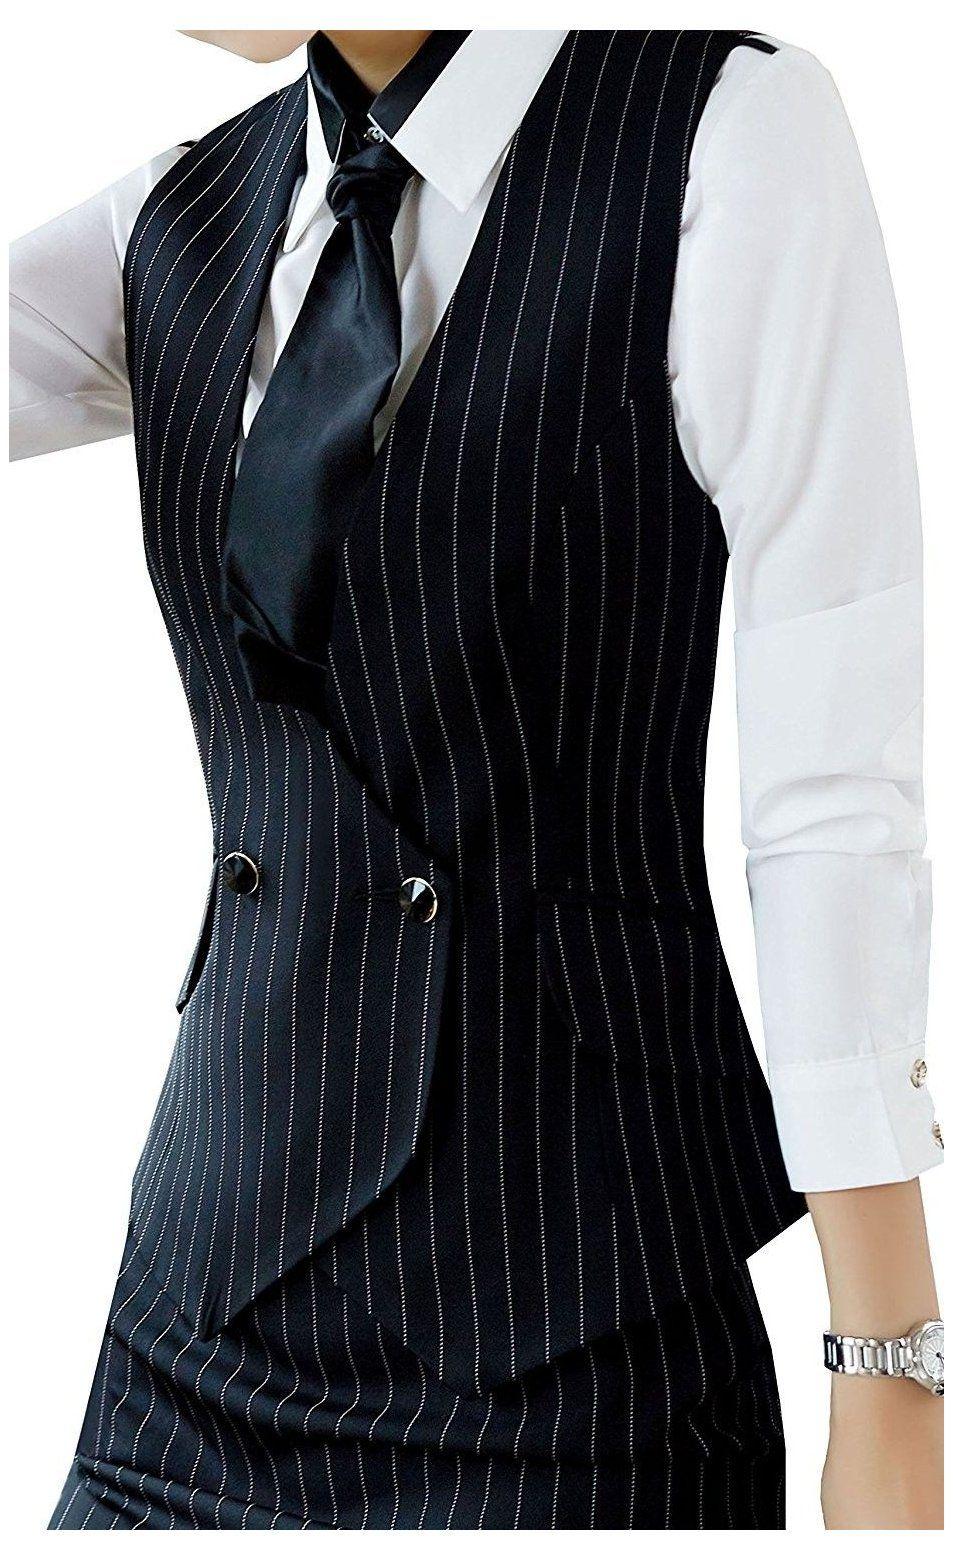 suit #vest Women's Clothing, Coats, Jackets & Vests, Vests,Women V-Neck  Lined Slim Fit Waistcoat Dreesy Suit Vest - Sty… in 2020   Clothes, Vest  fashion, Clothes for women